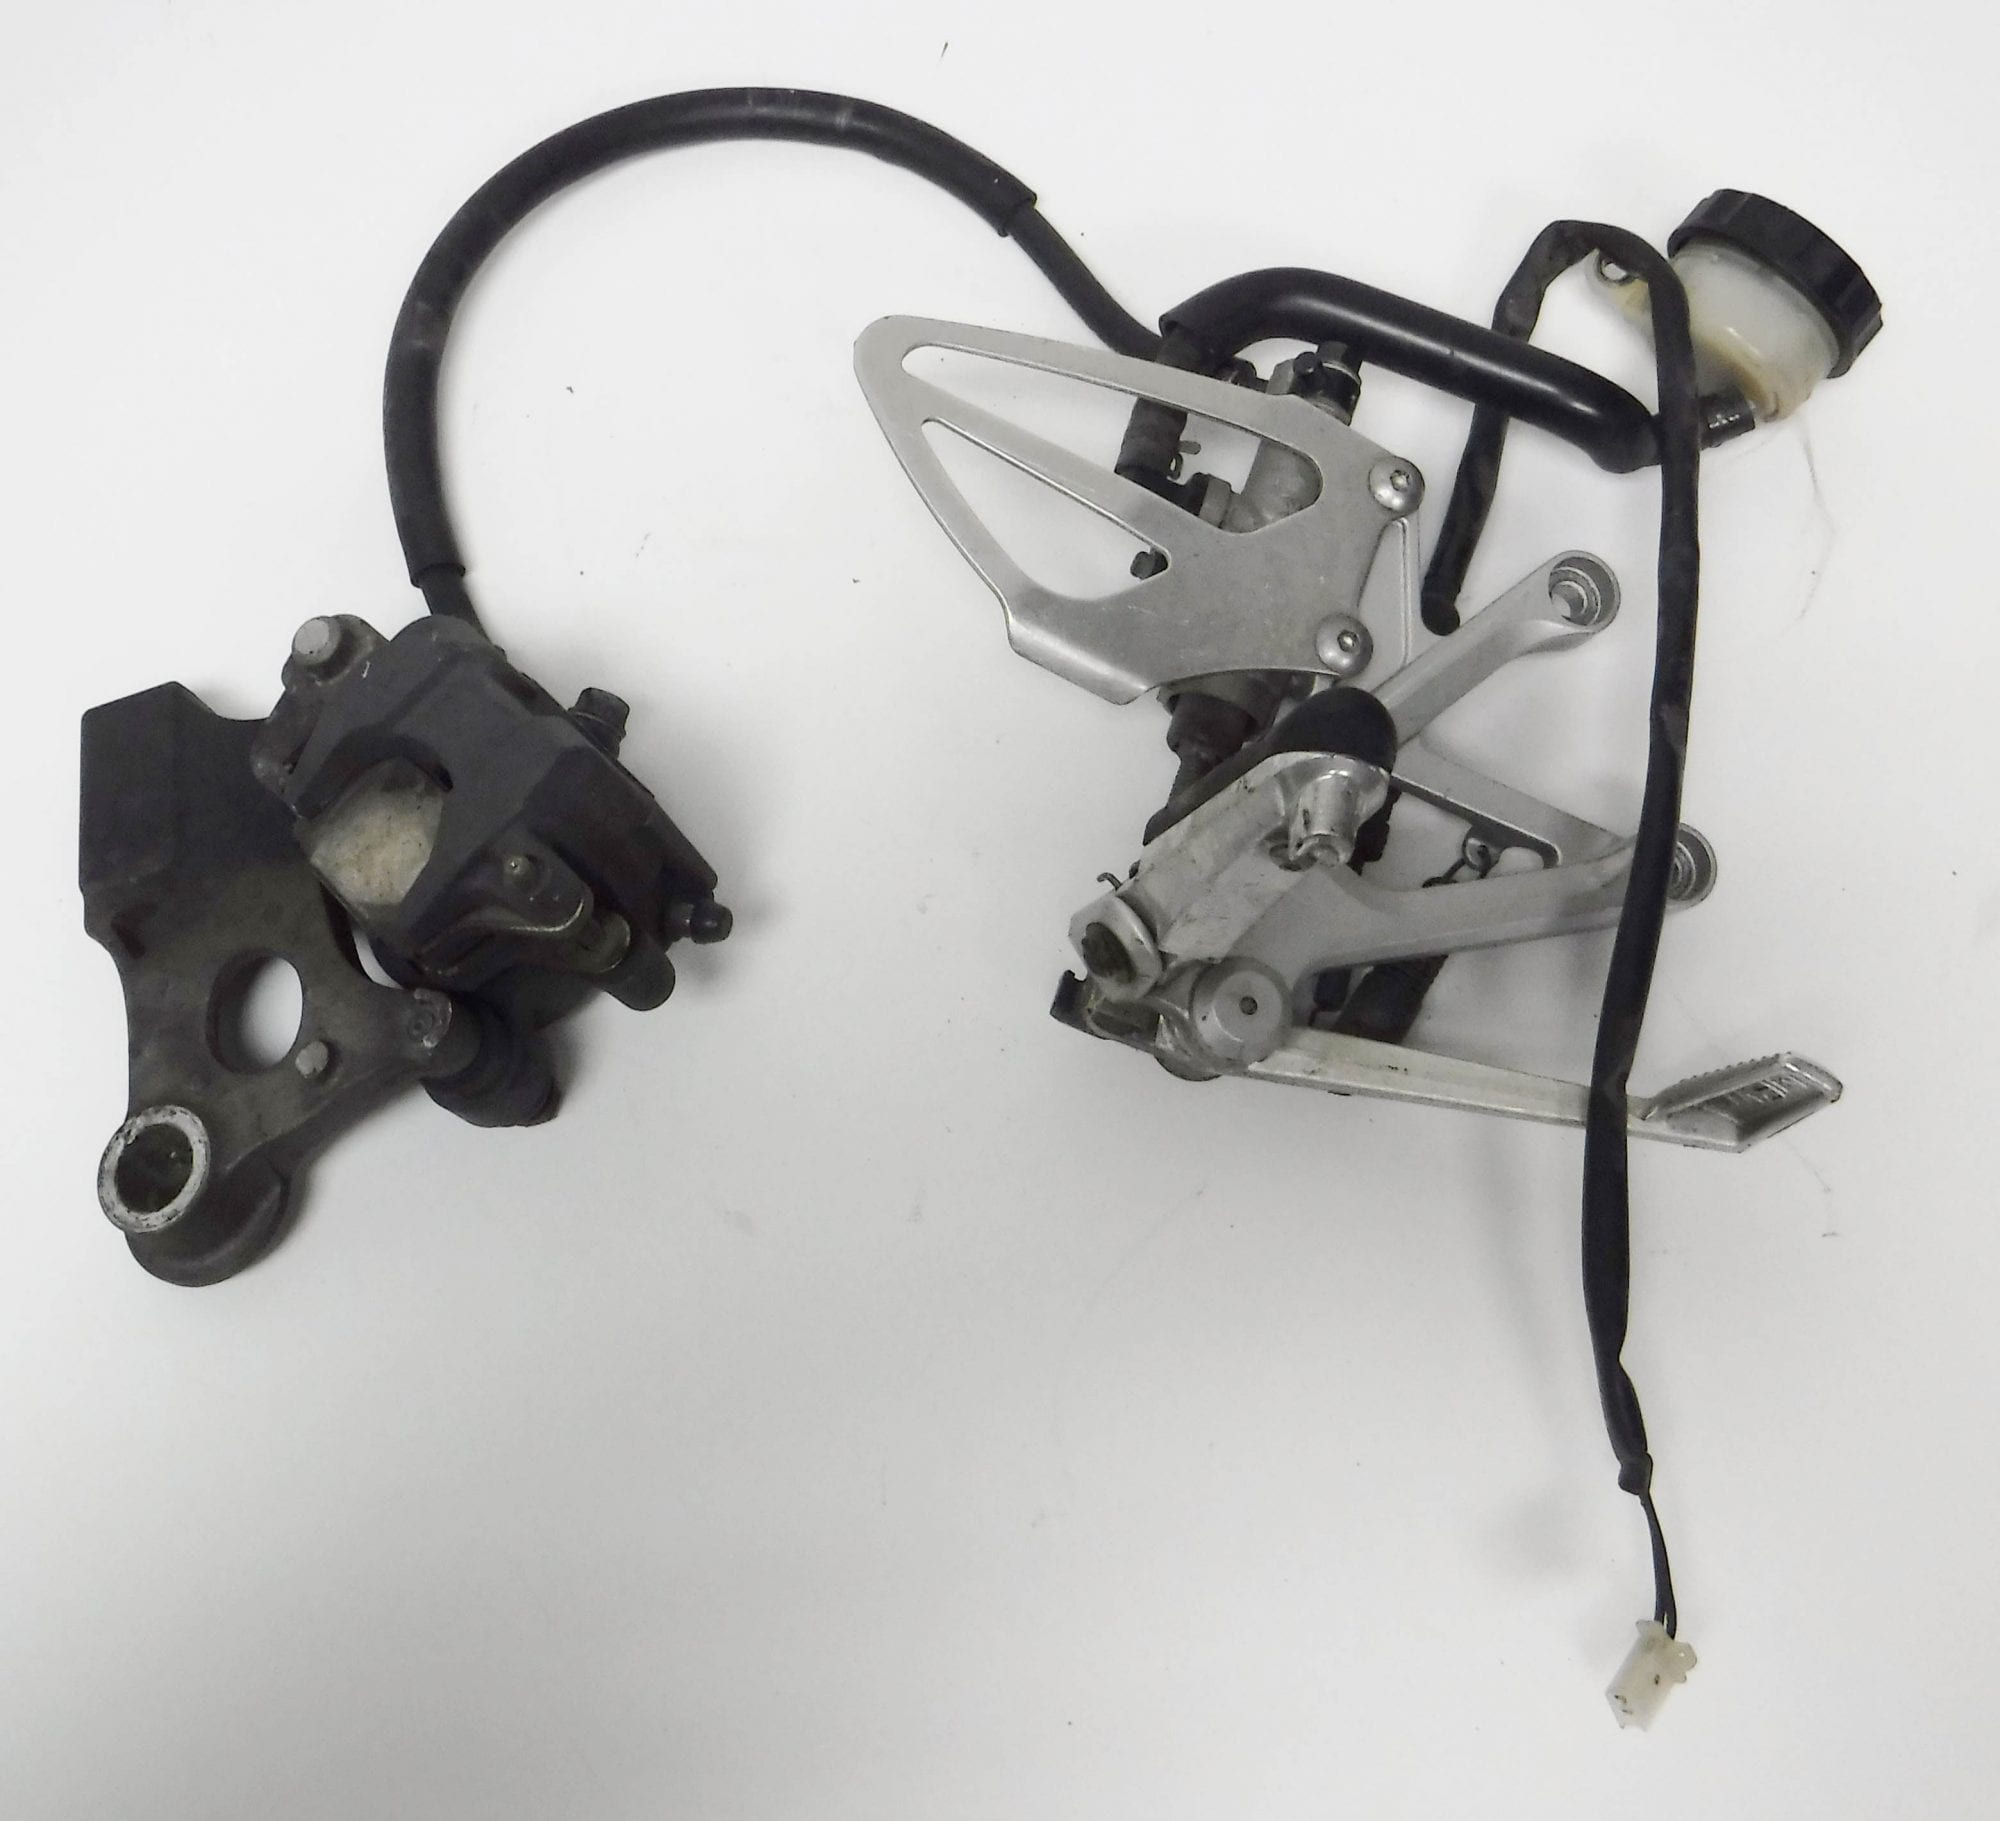 Brake Caliper Rear Honda CBR600 CBR 600 F4 99 00 43150-MBW-006